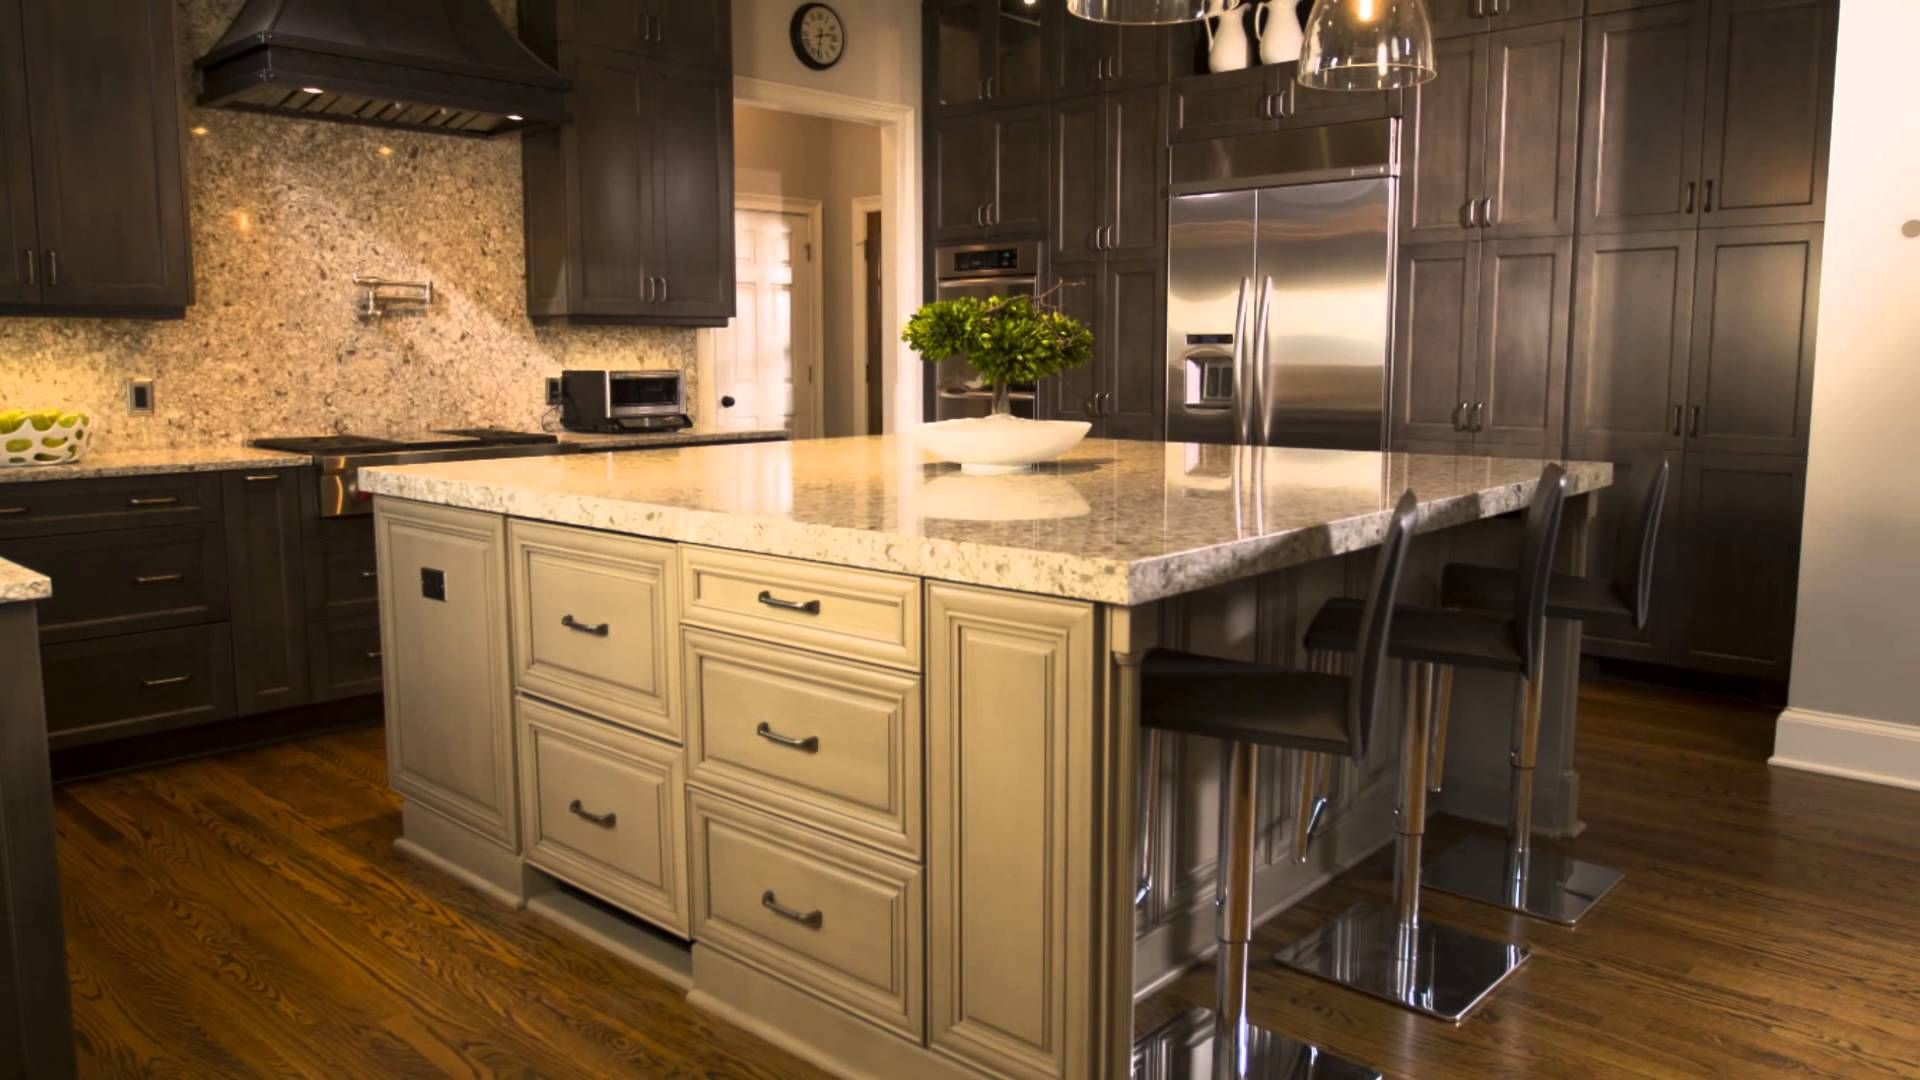 A Kitchen Renovation Success Story Featuring Kitchen Craft Cabinetry Unique Decor 87754435 Kitchen Remo Kitchen Crafts Kitchen Craft Cabinets Kitchen Remodel